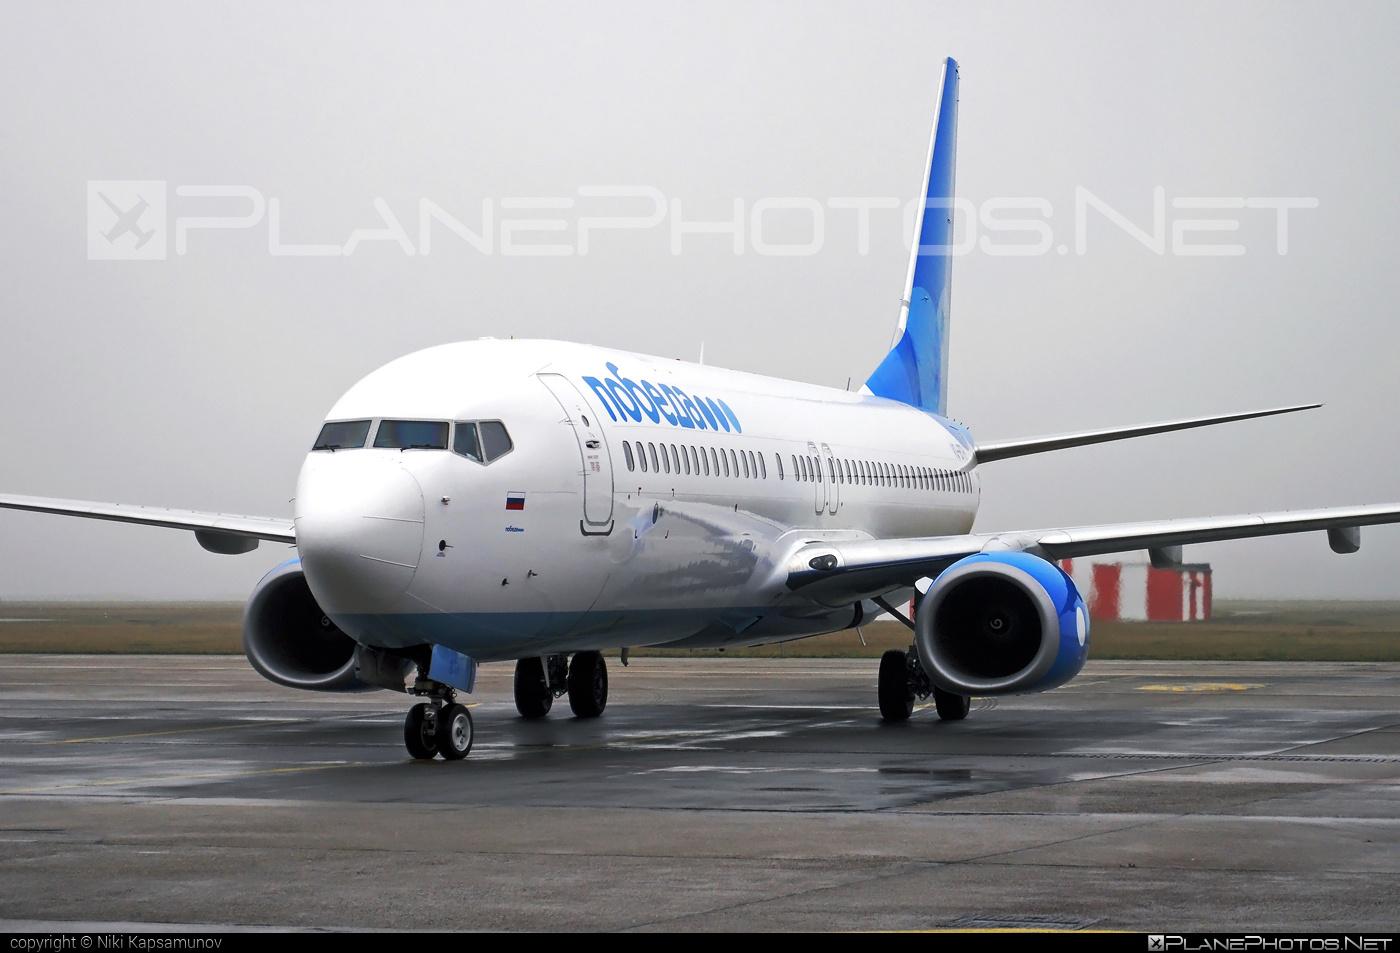 Boeing 737-800 - VQ-BTH operated by Pobeda #b737 #b737nextgen #b737ng #boeing #boeing737